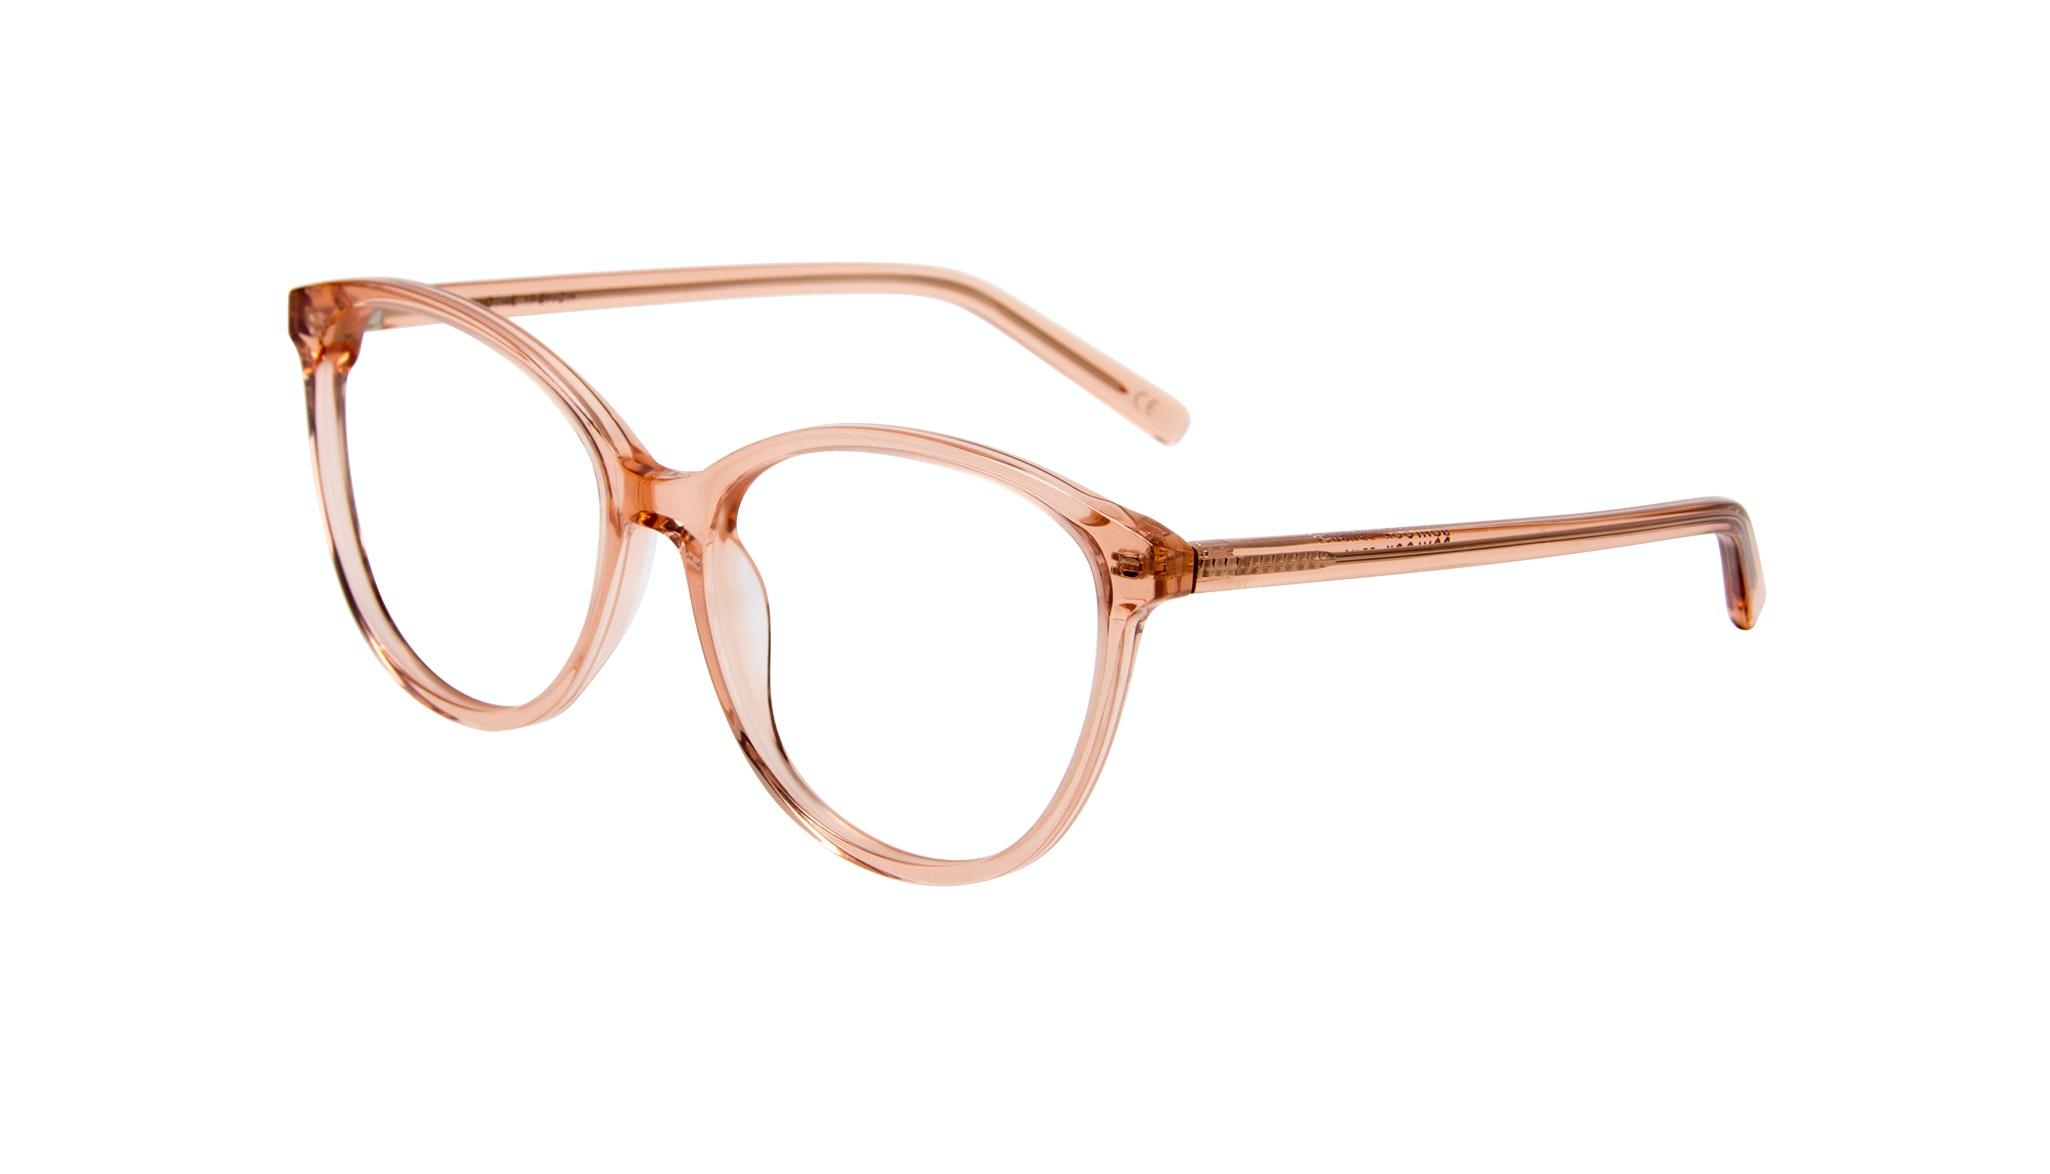 Affordable Fashion Glasses Round Eyeglasses Women Imagine Peach Tilt